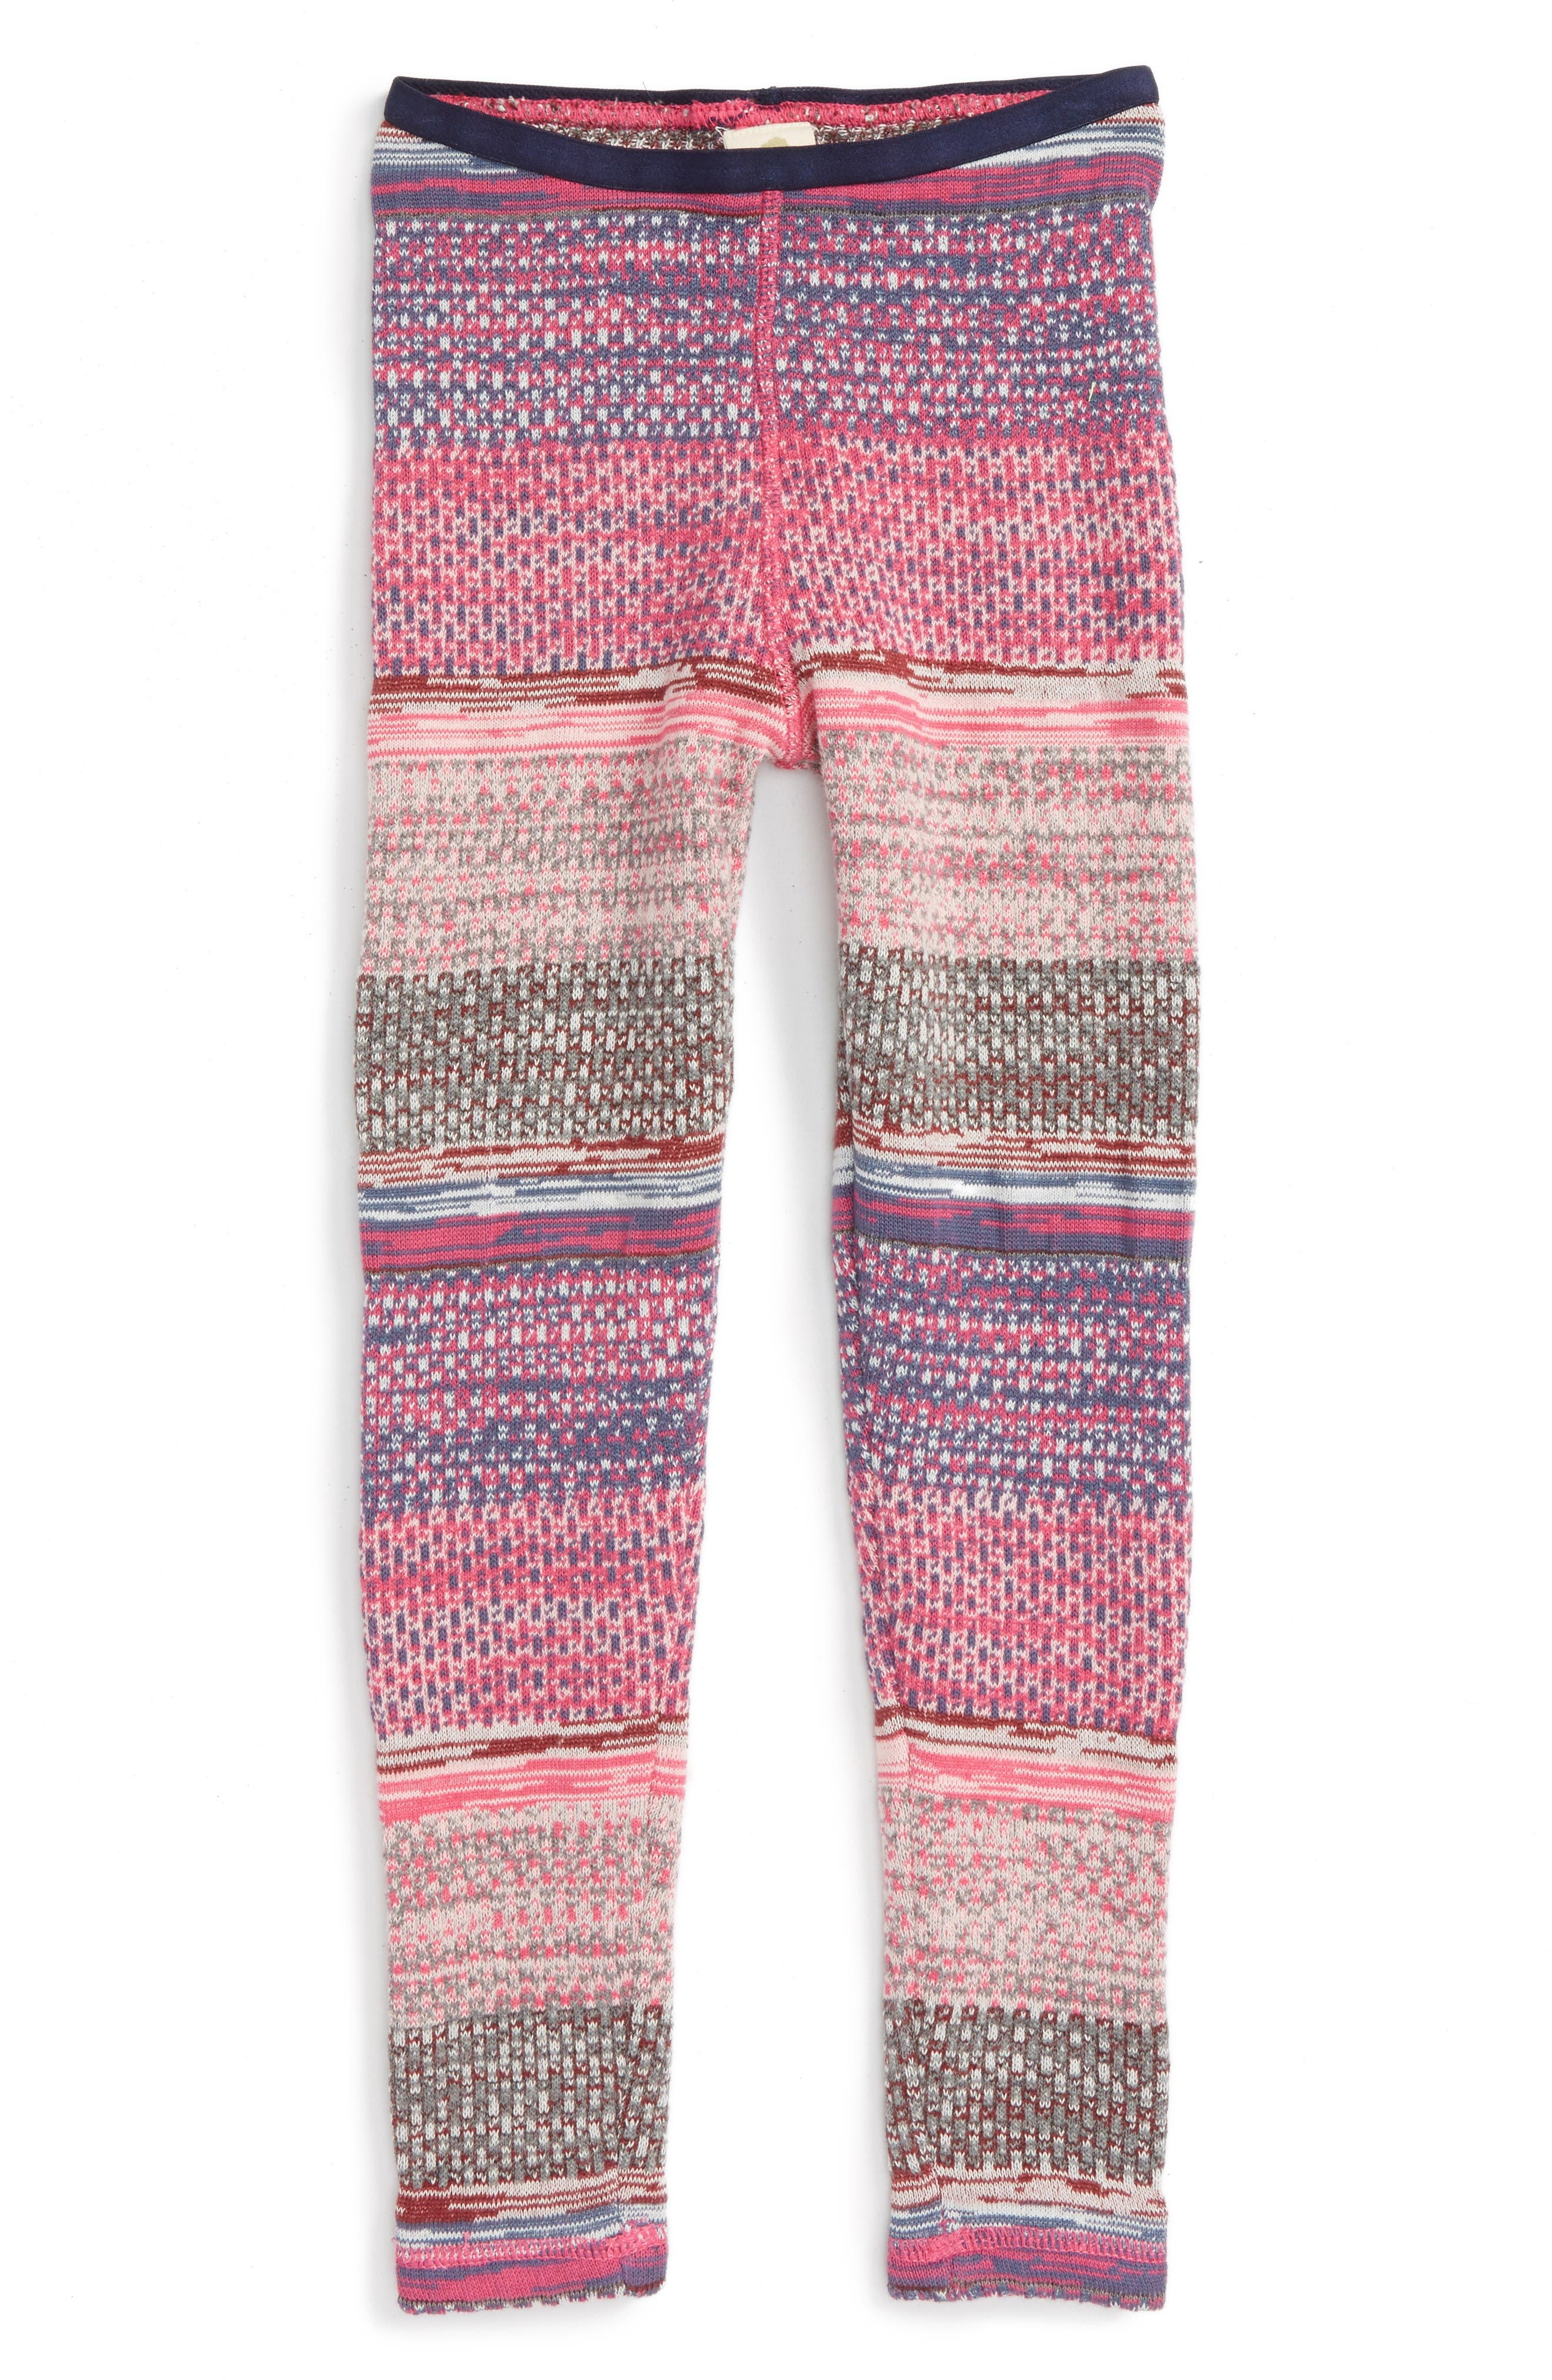 Pattern Knit Leggings,                             Main thumbnail 1, color,                             Pink Magenta Spacedye